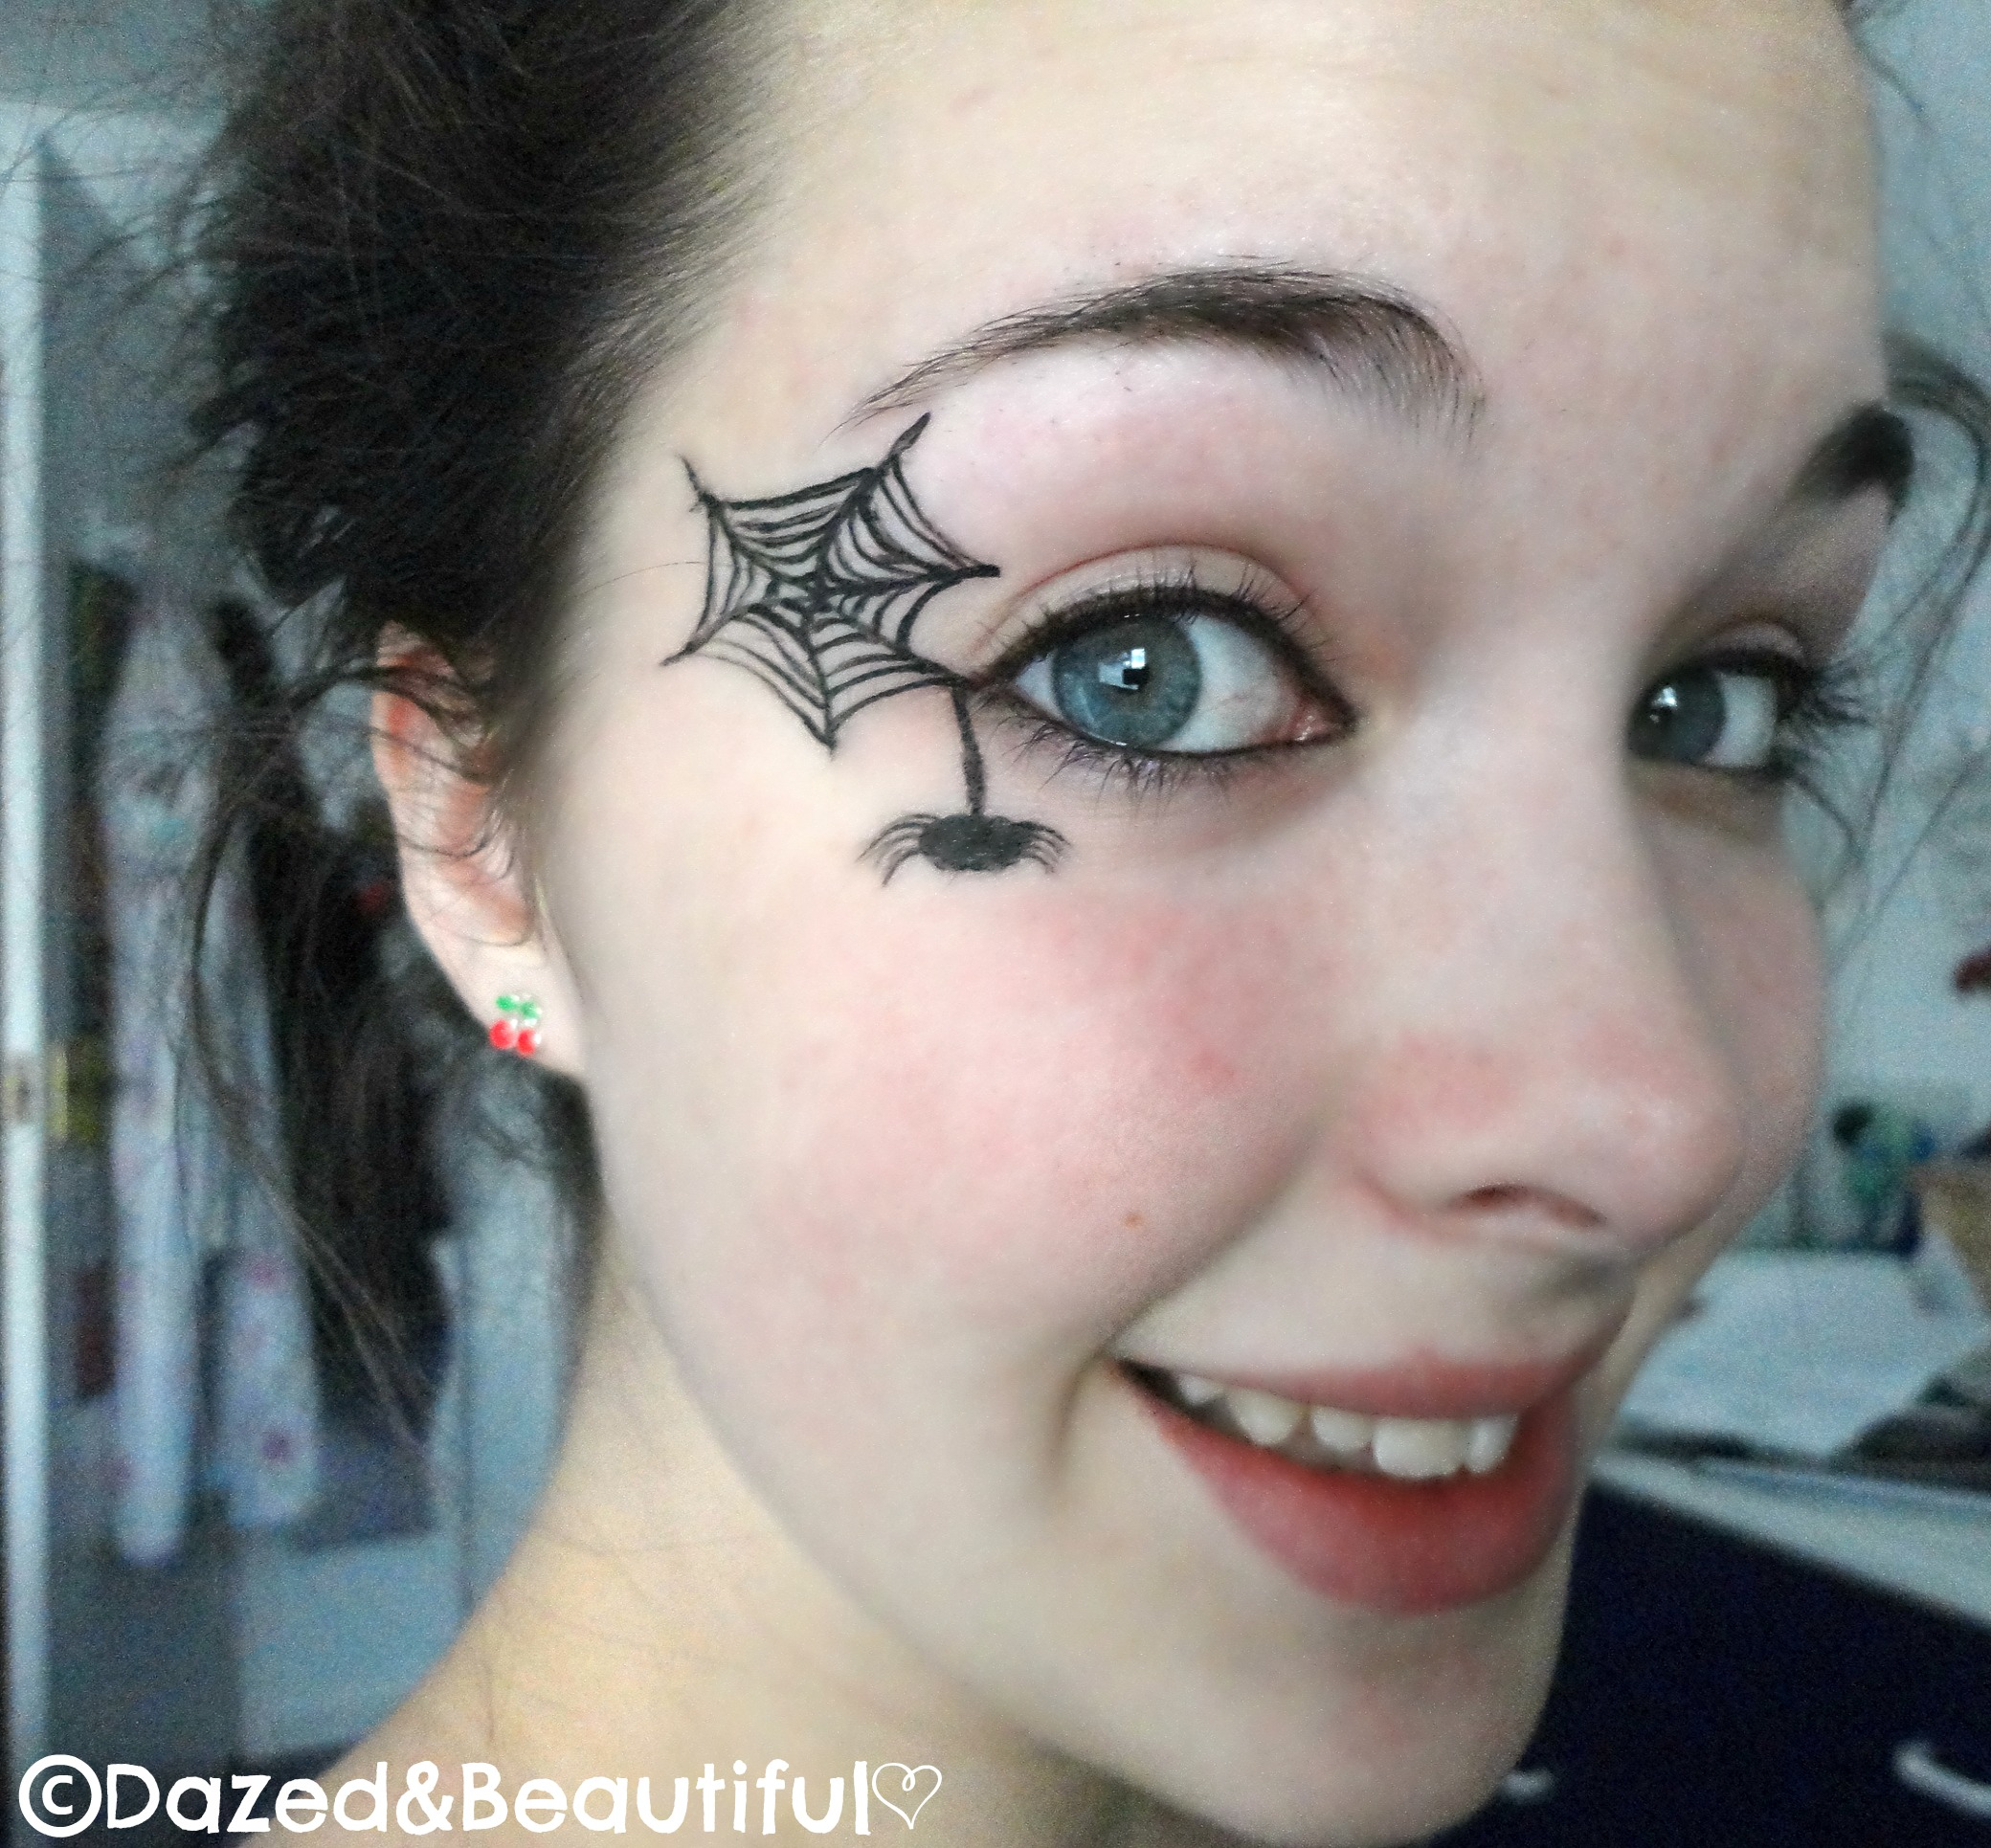 Spider Eye Makeup – Dazed&Beautiful